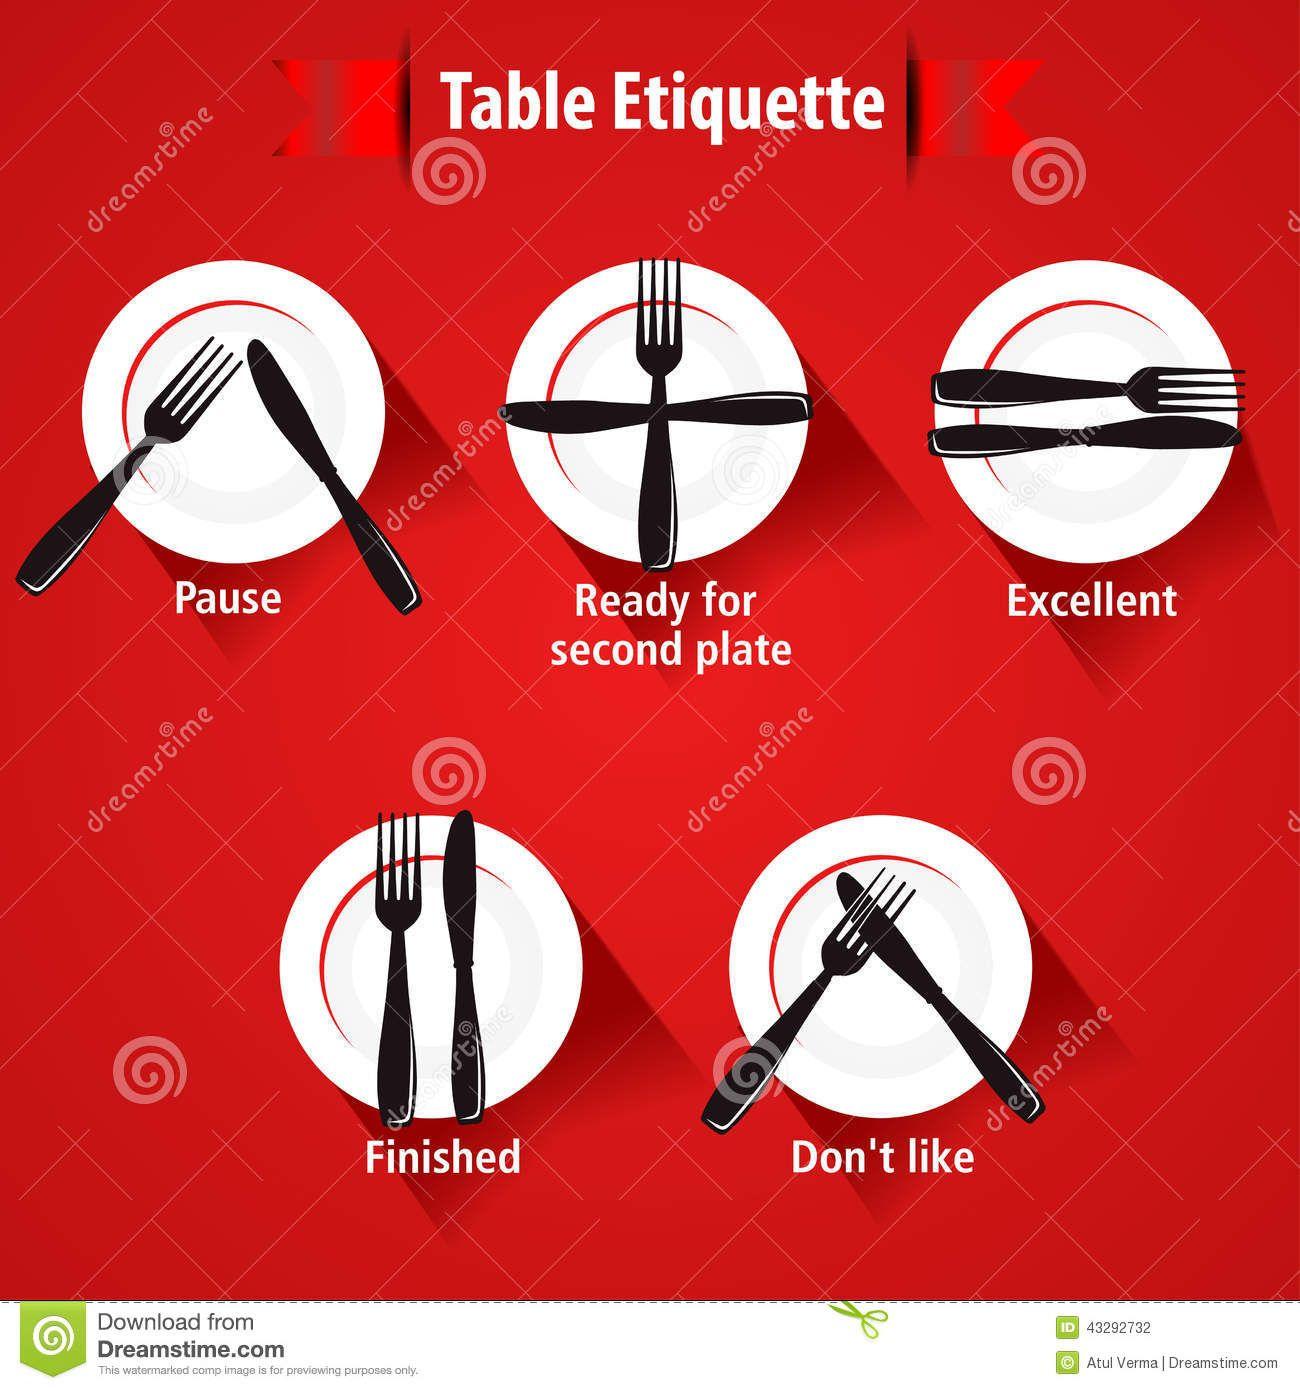 Menu clipart etiquette dinner. Dining pinterest